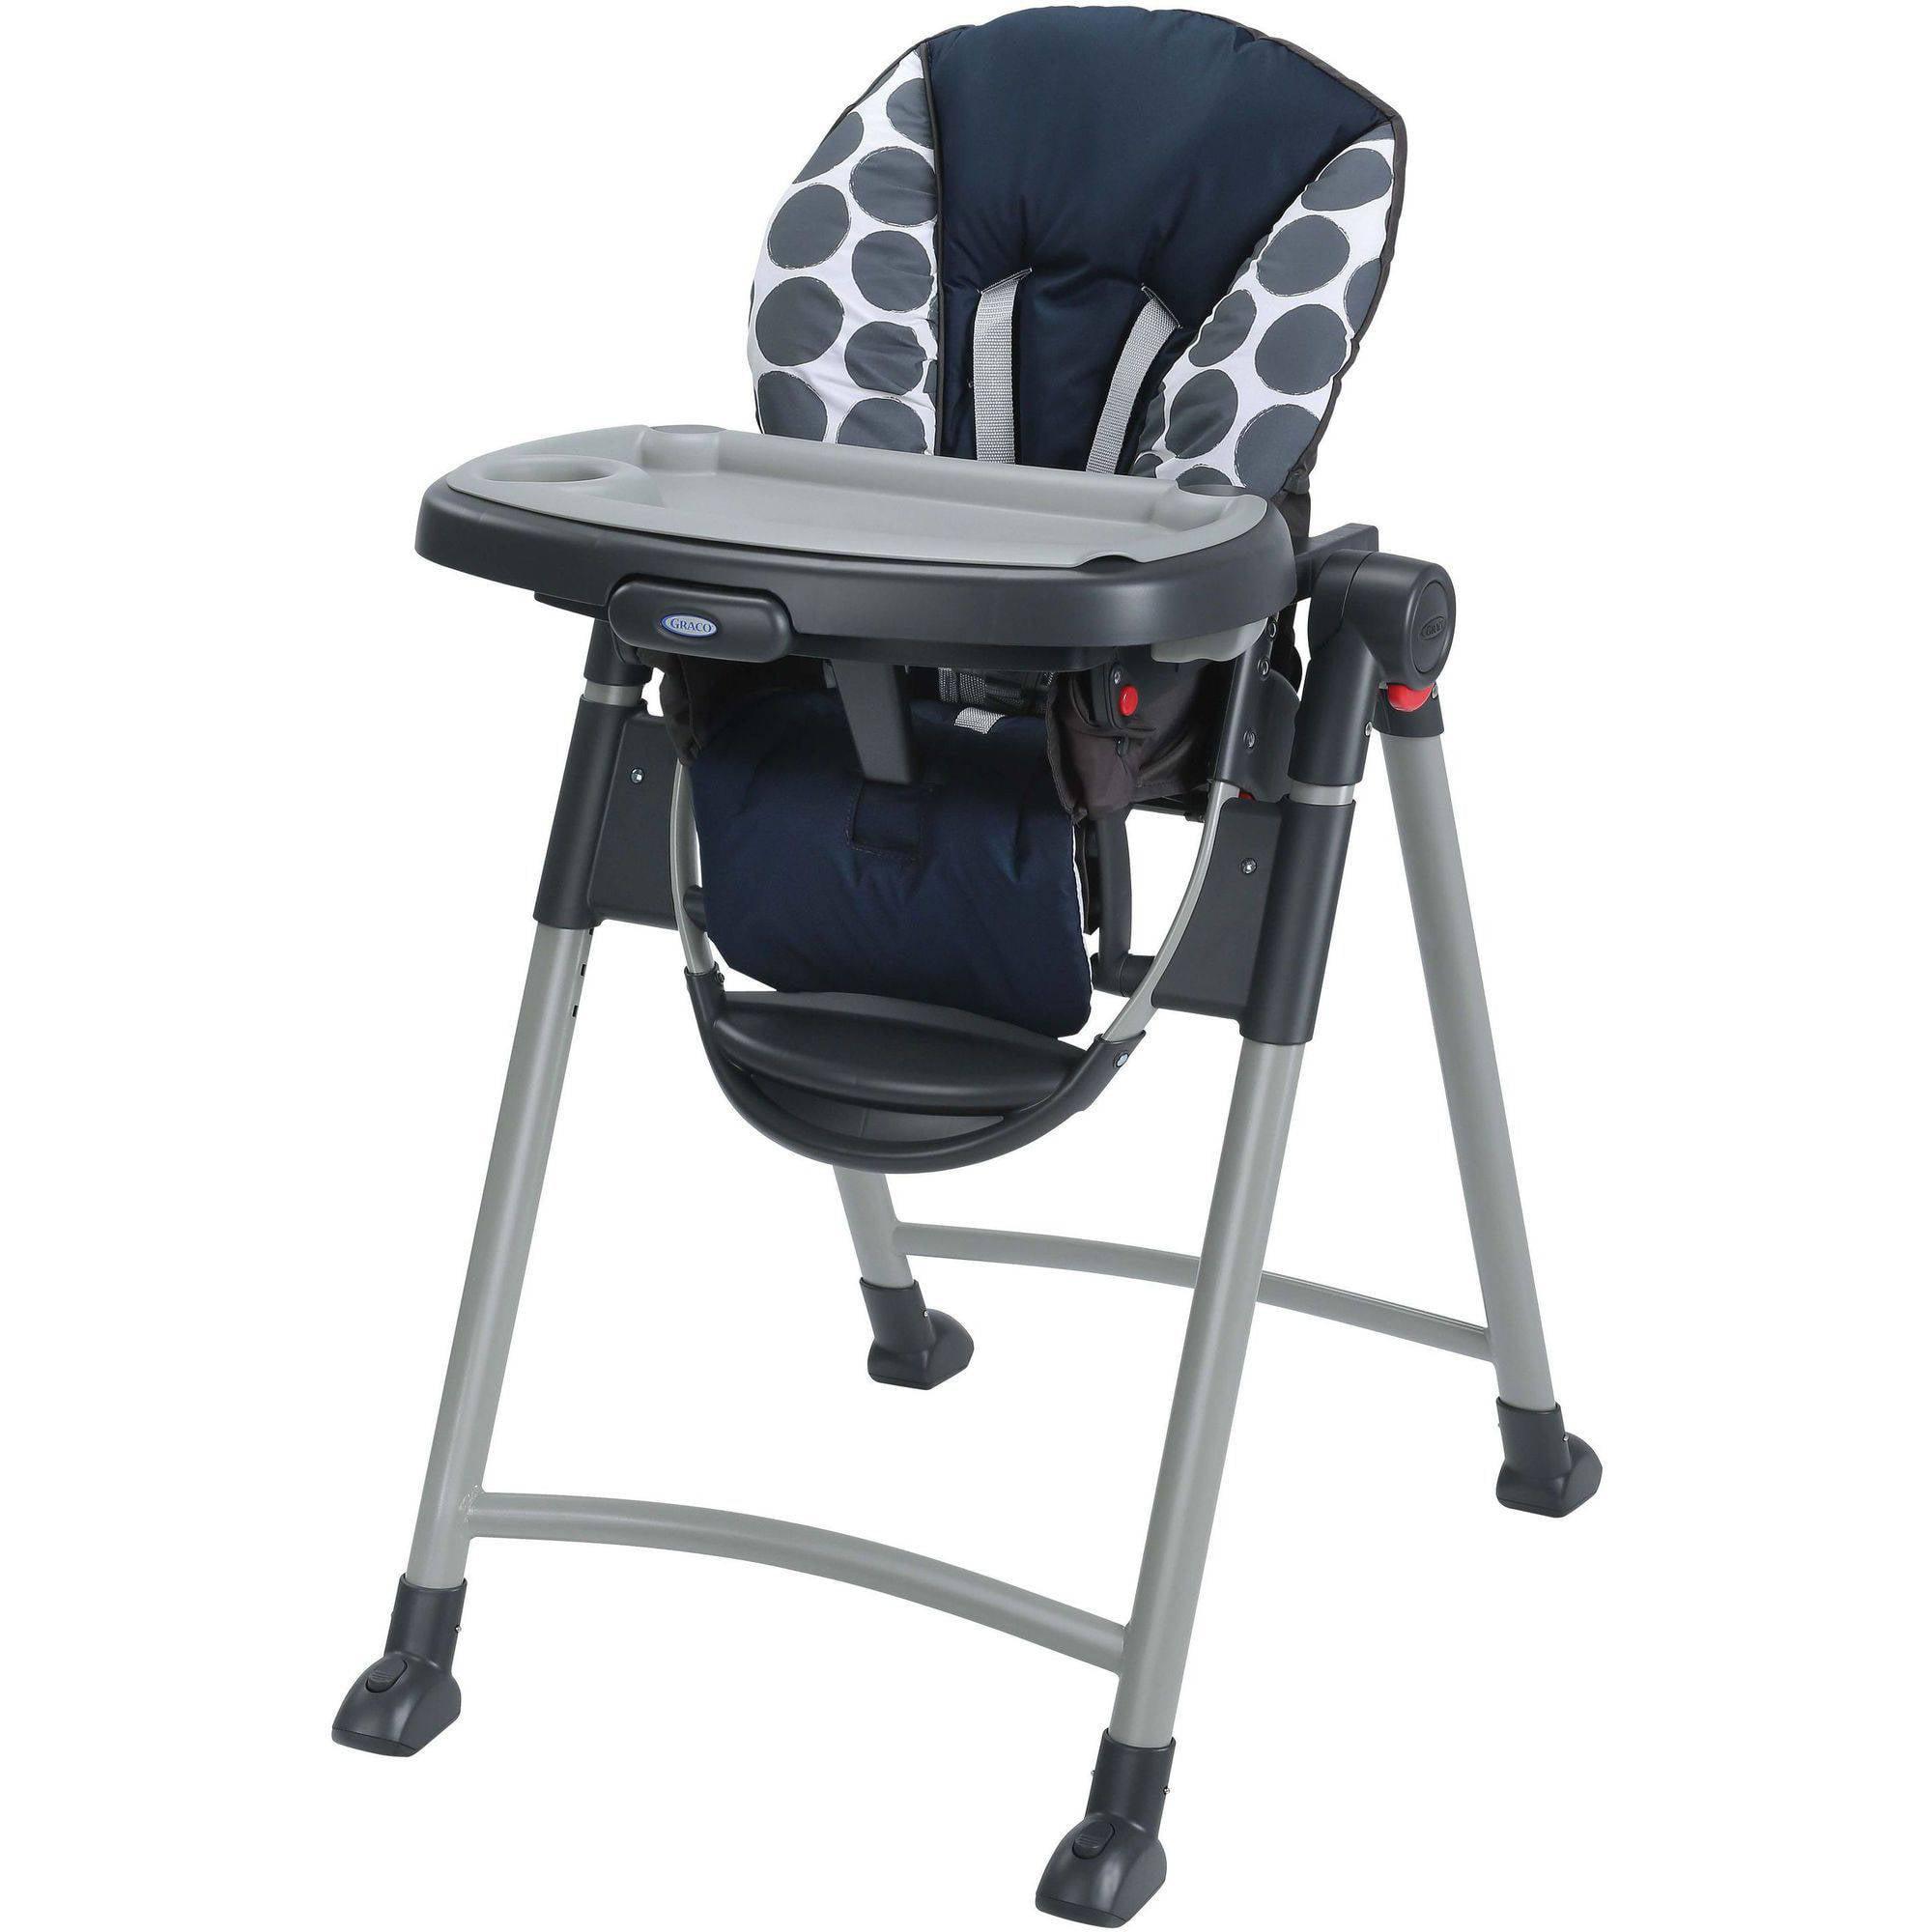 Baby high chair graco - Graco Contempo High Chair